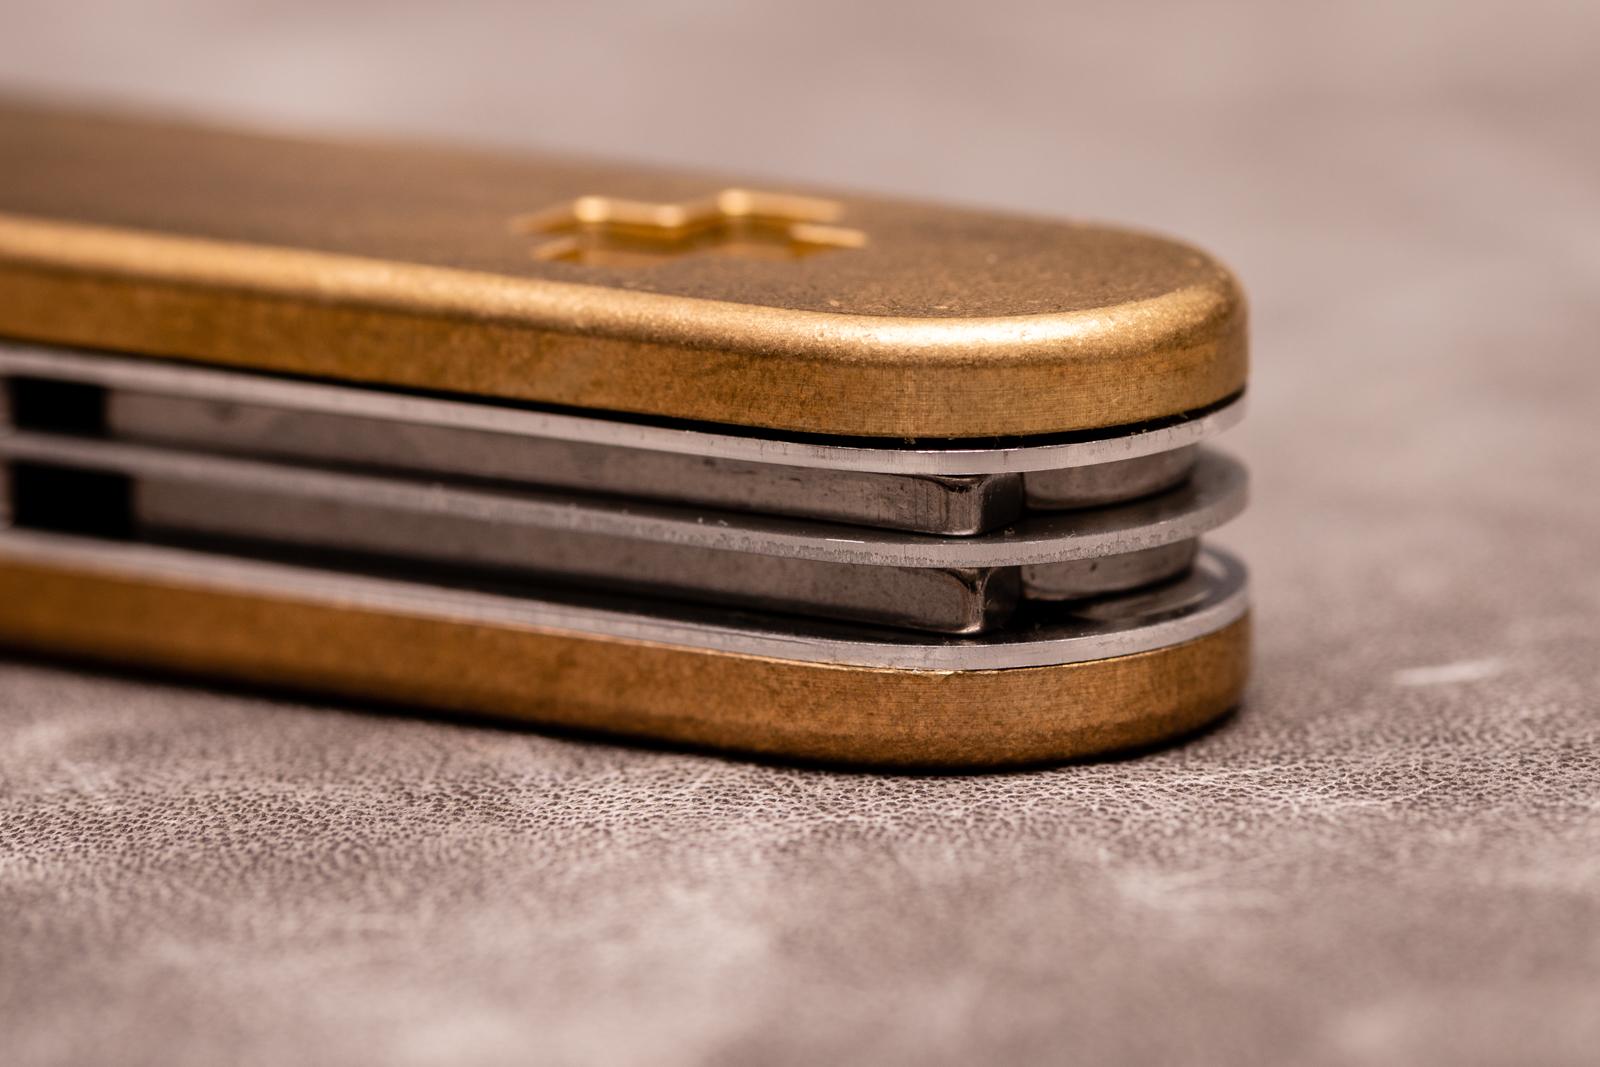 Daily Customs - Brass SAK Scales